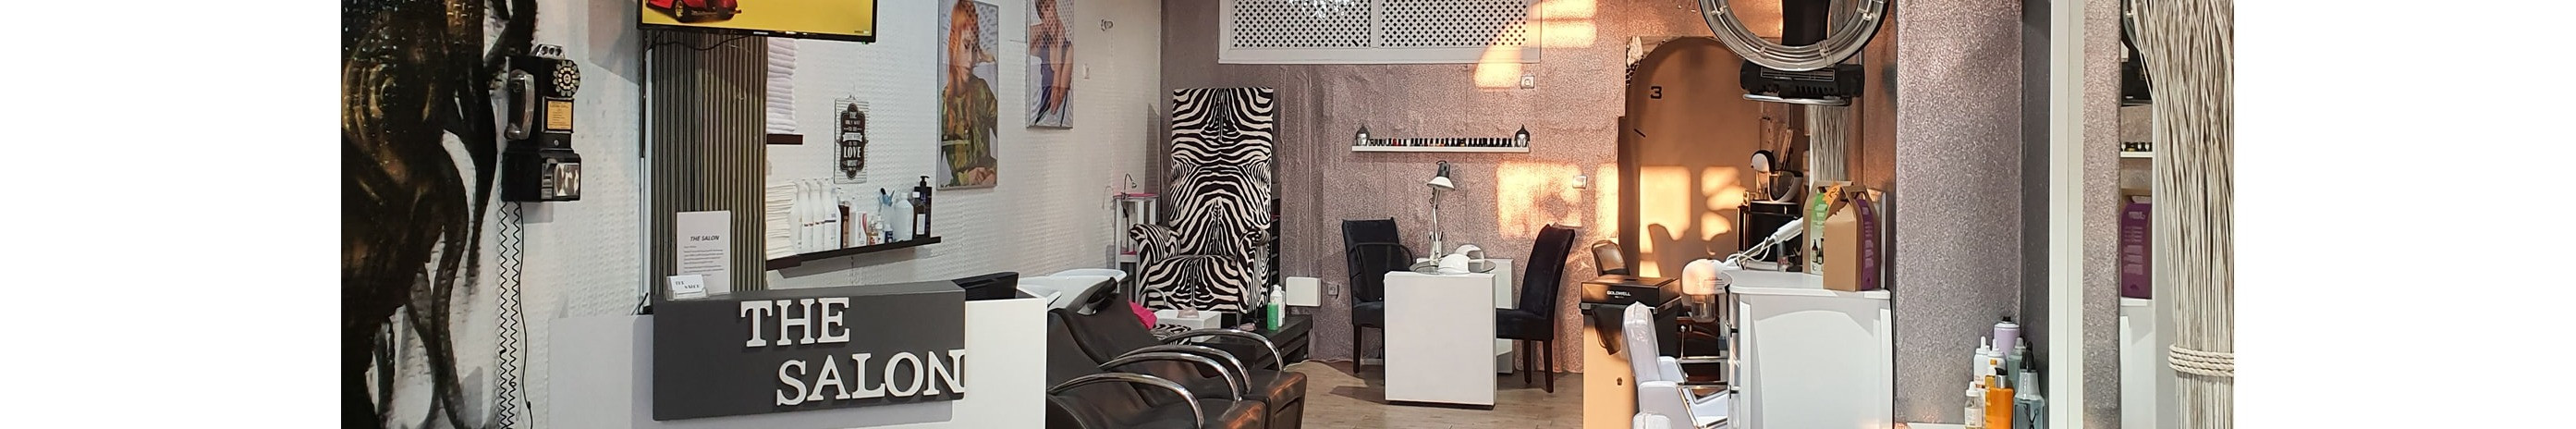 Hair/Beauty/Nails and Massage Salon in Benalmadena